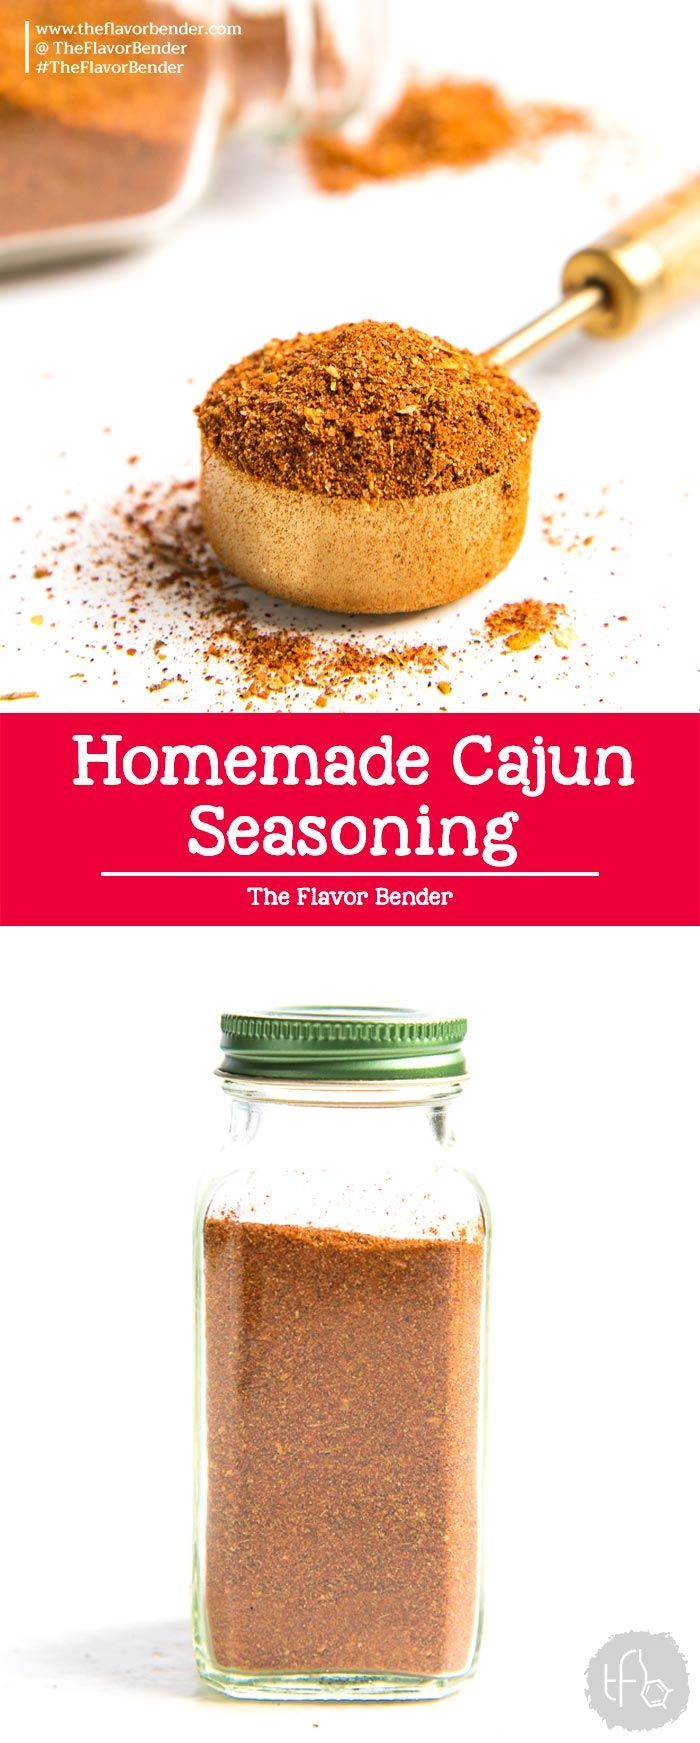 Cajun Seasoning Recipe - The Flavor Bender